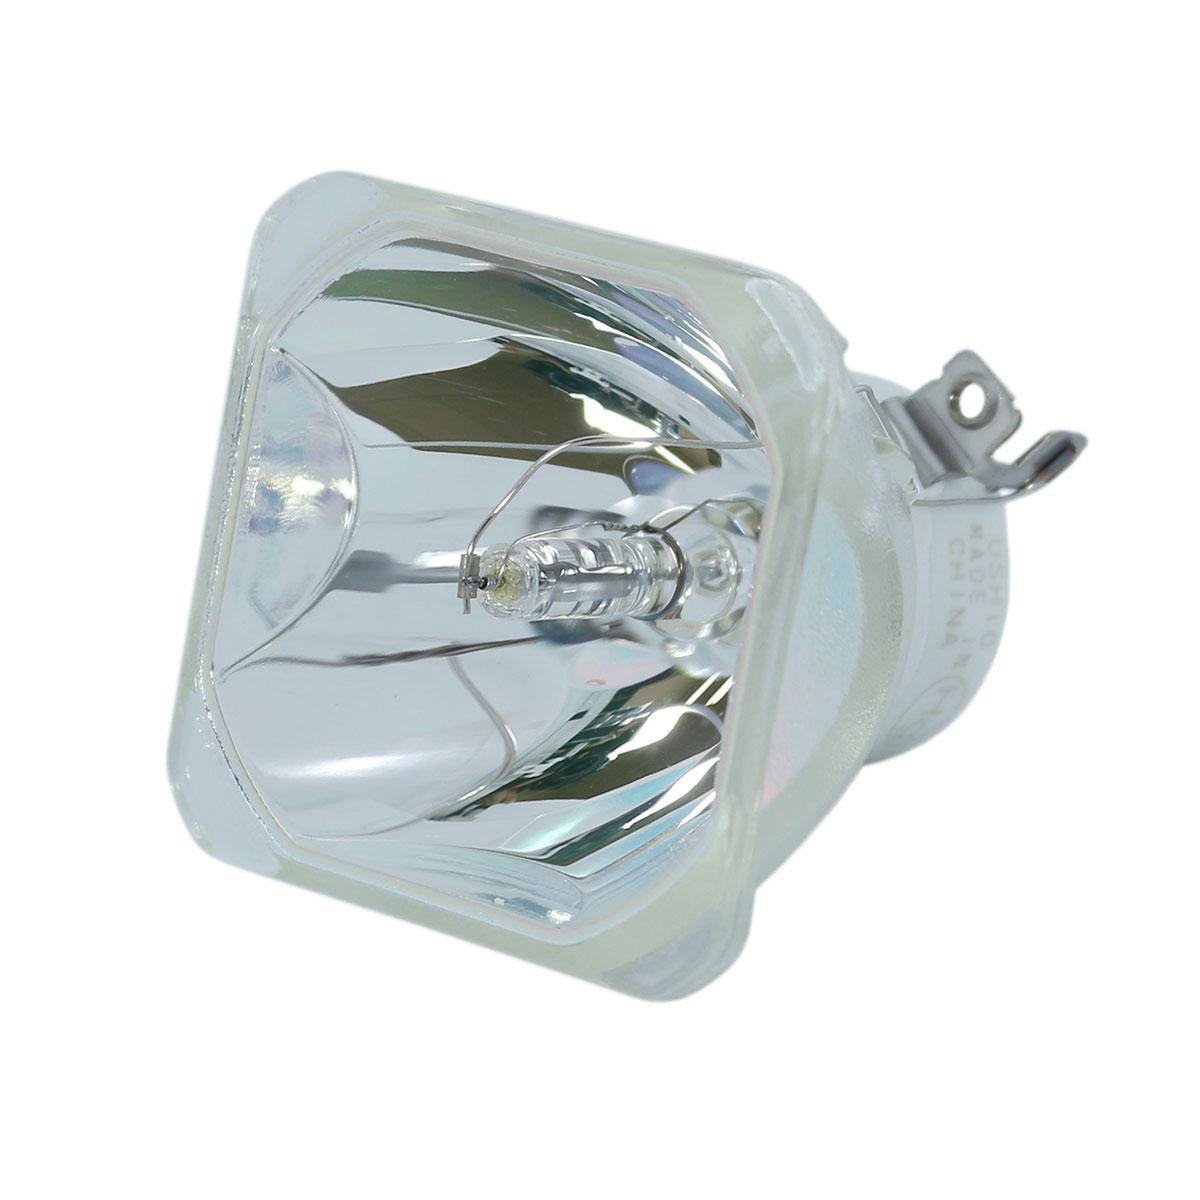 Compatible ET-LAT100 ETLAT100 For Panasonic PT-TW230 PT-TW230EA PT-TW230REA PT-TW230U PT-TW231RE PT-TW231RU Projector Bulb Lamp pt ae1000 pt ae2000 pt ae3000 projector lamp bulb et lae1000 for panasonic high quality totally new